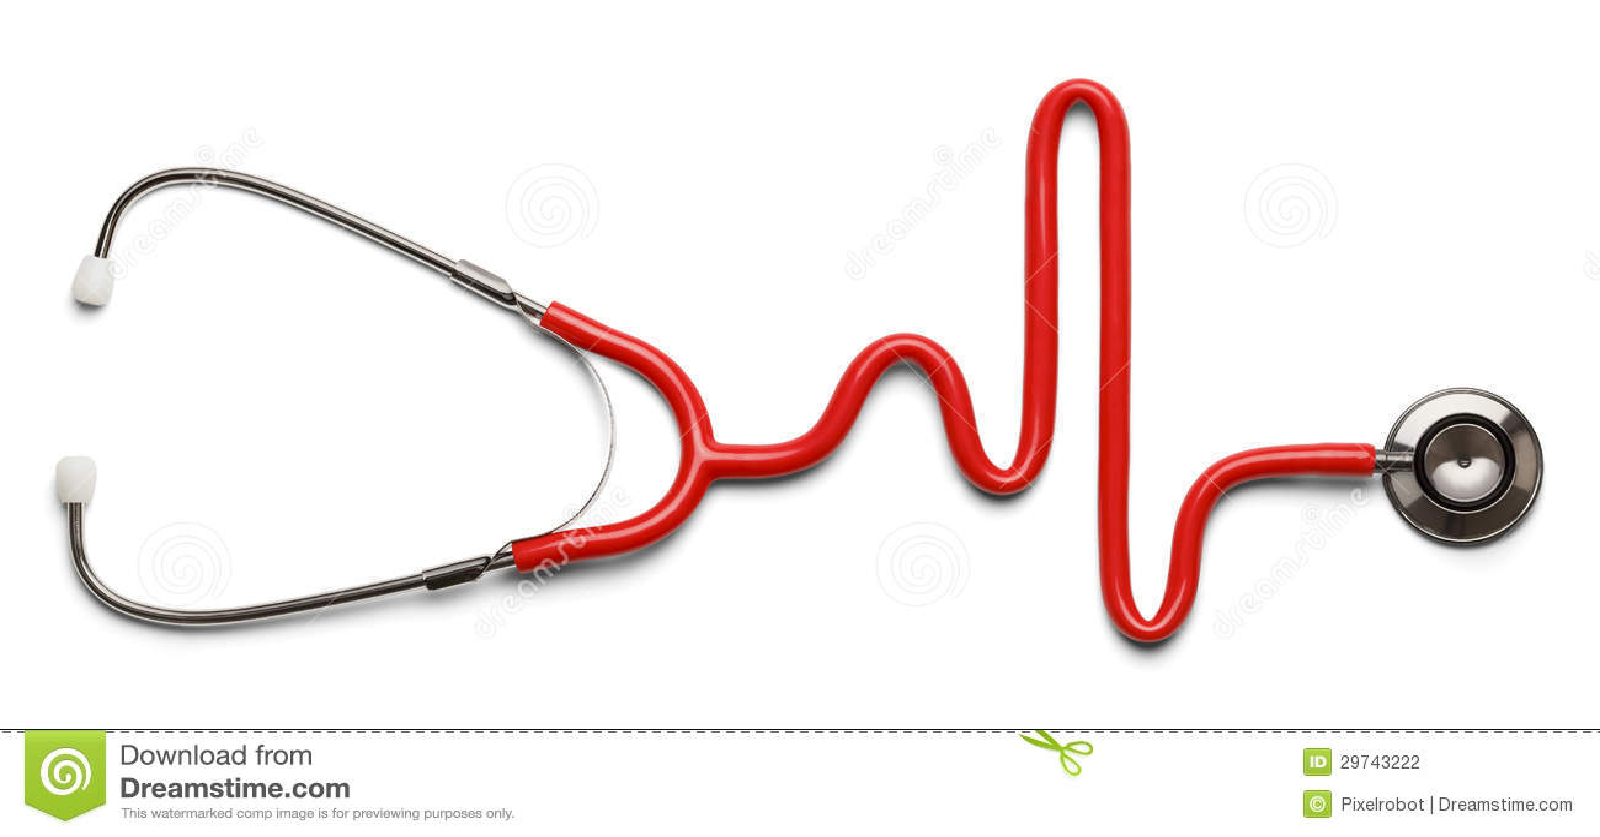 Stethoscope Pulse